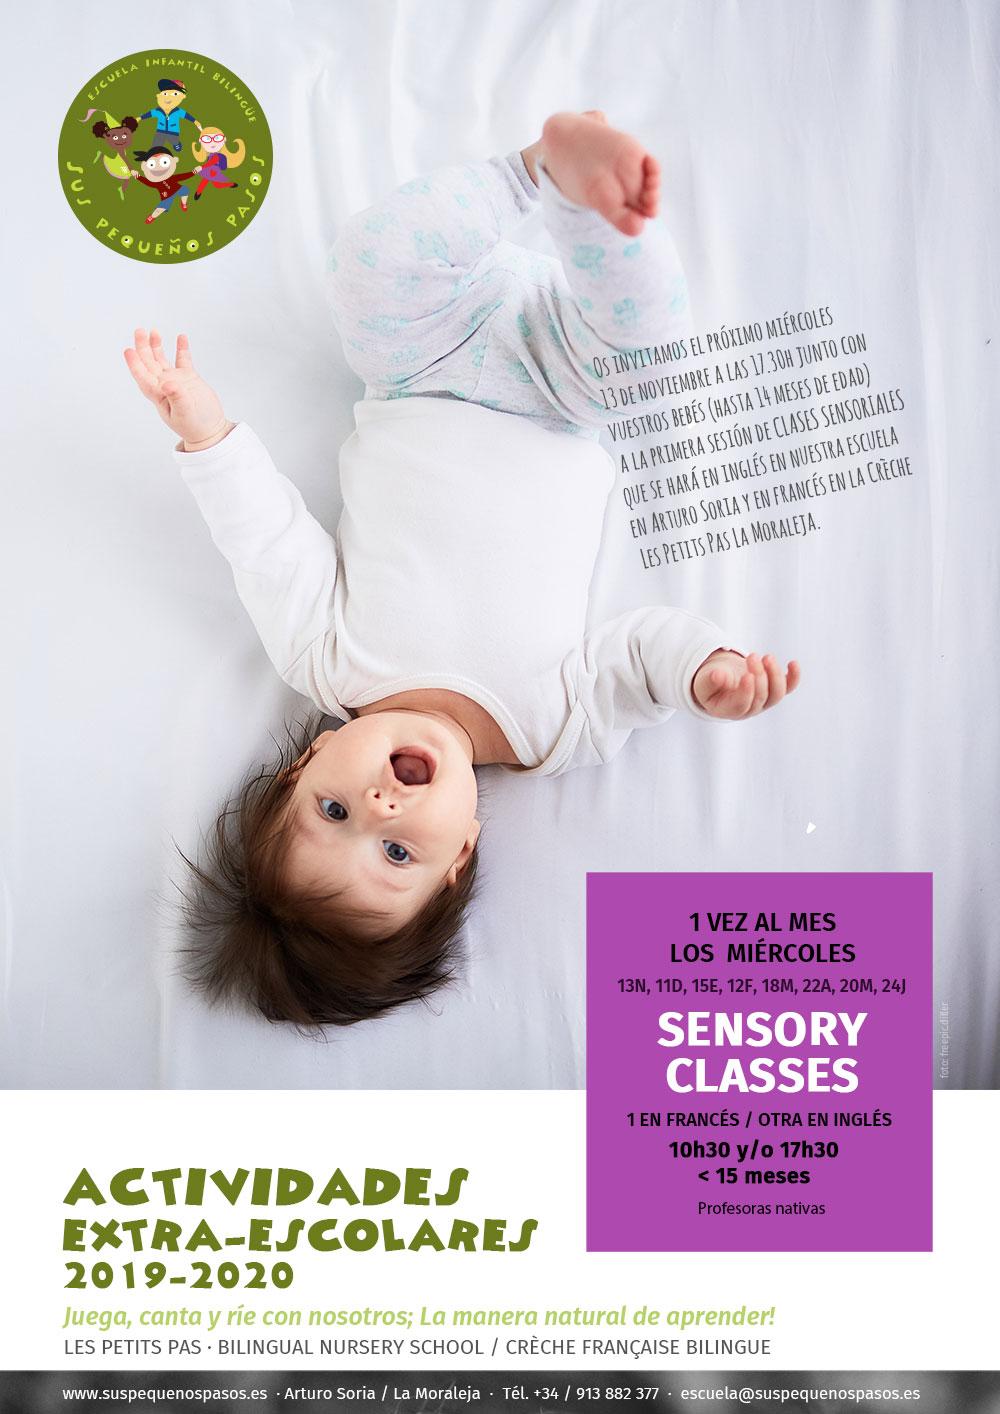 CLASES SENSORIALES para Bebés, Mamas & Papas – Miércoles 13N